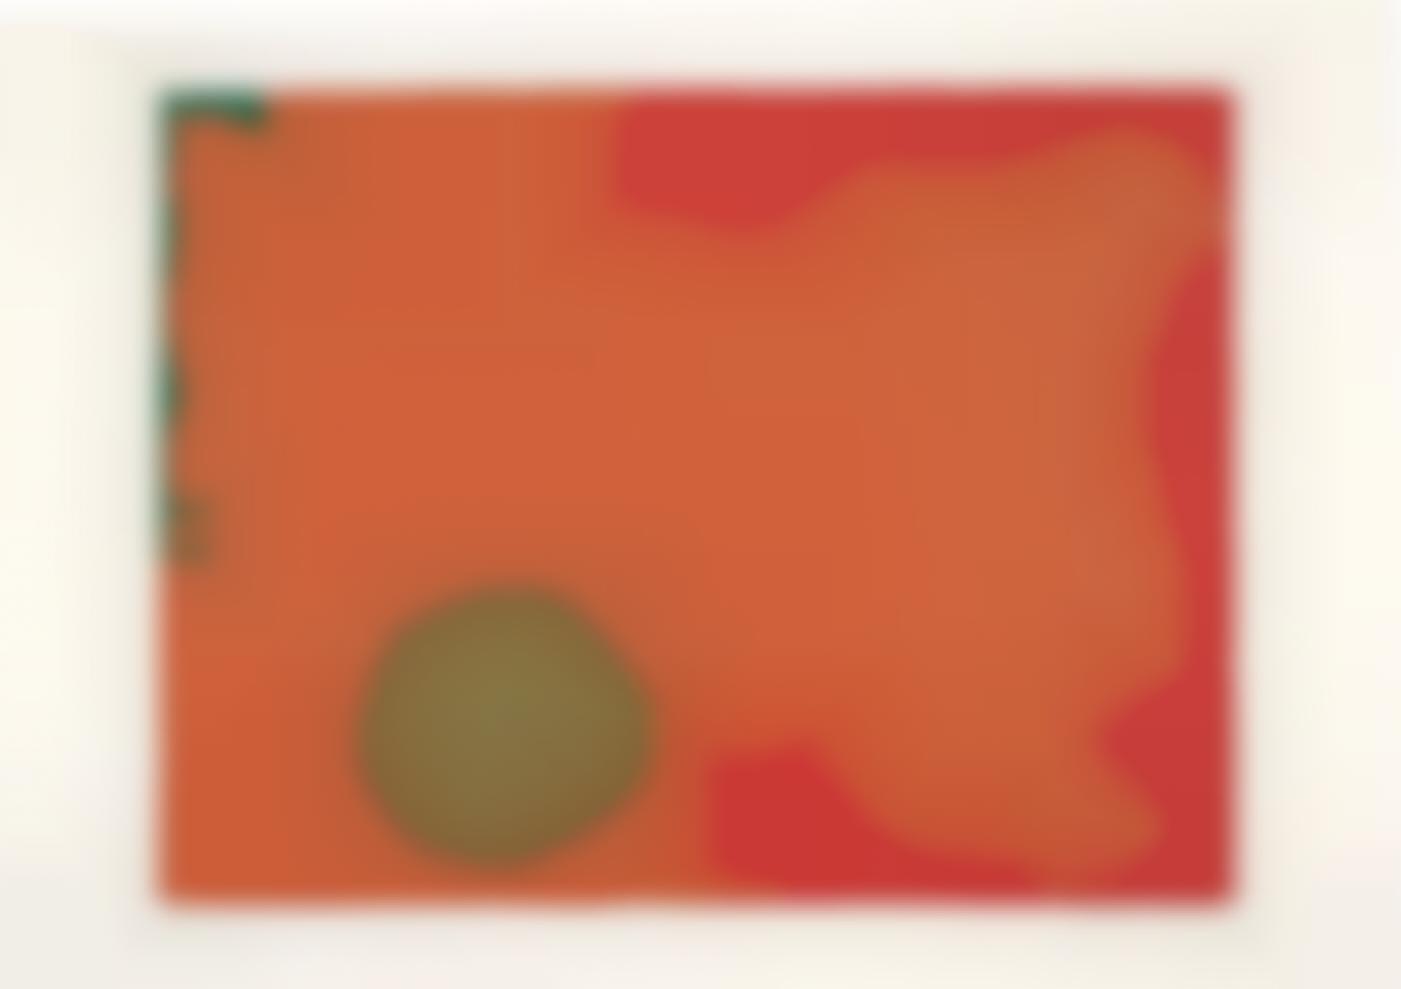 Patrick Heron-Umber Disk and Red Edge-1970